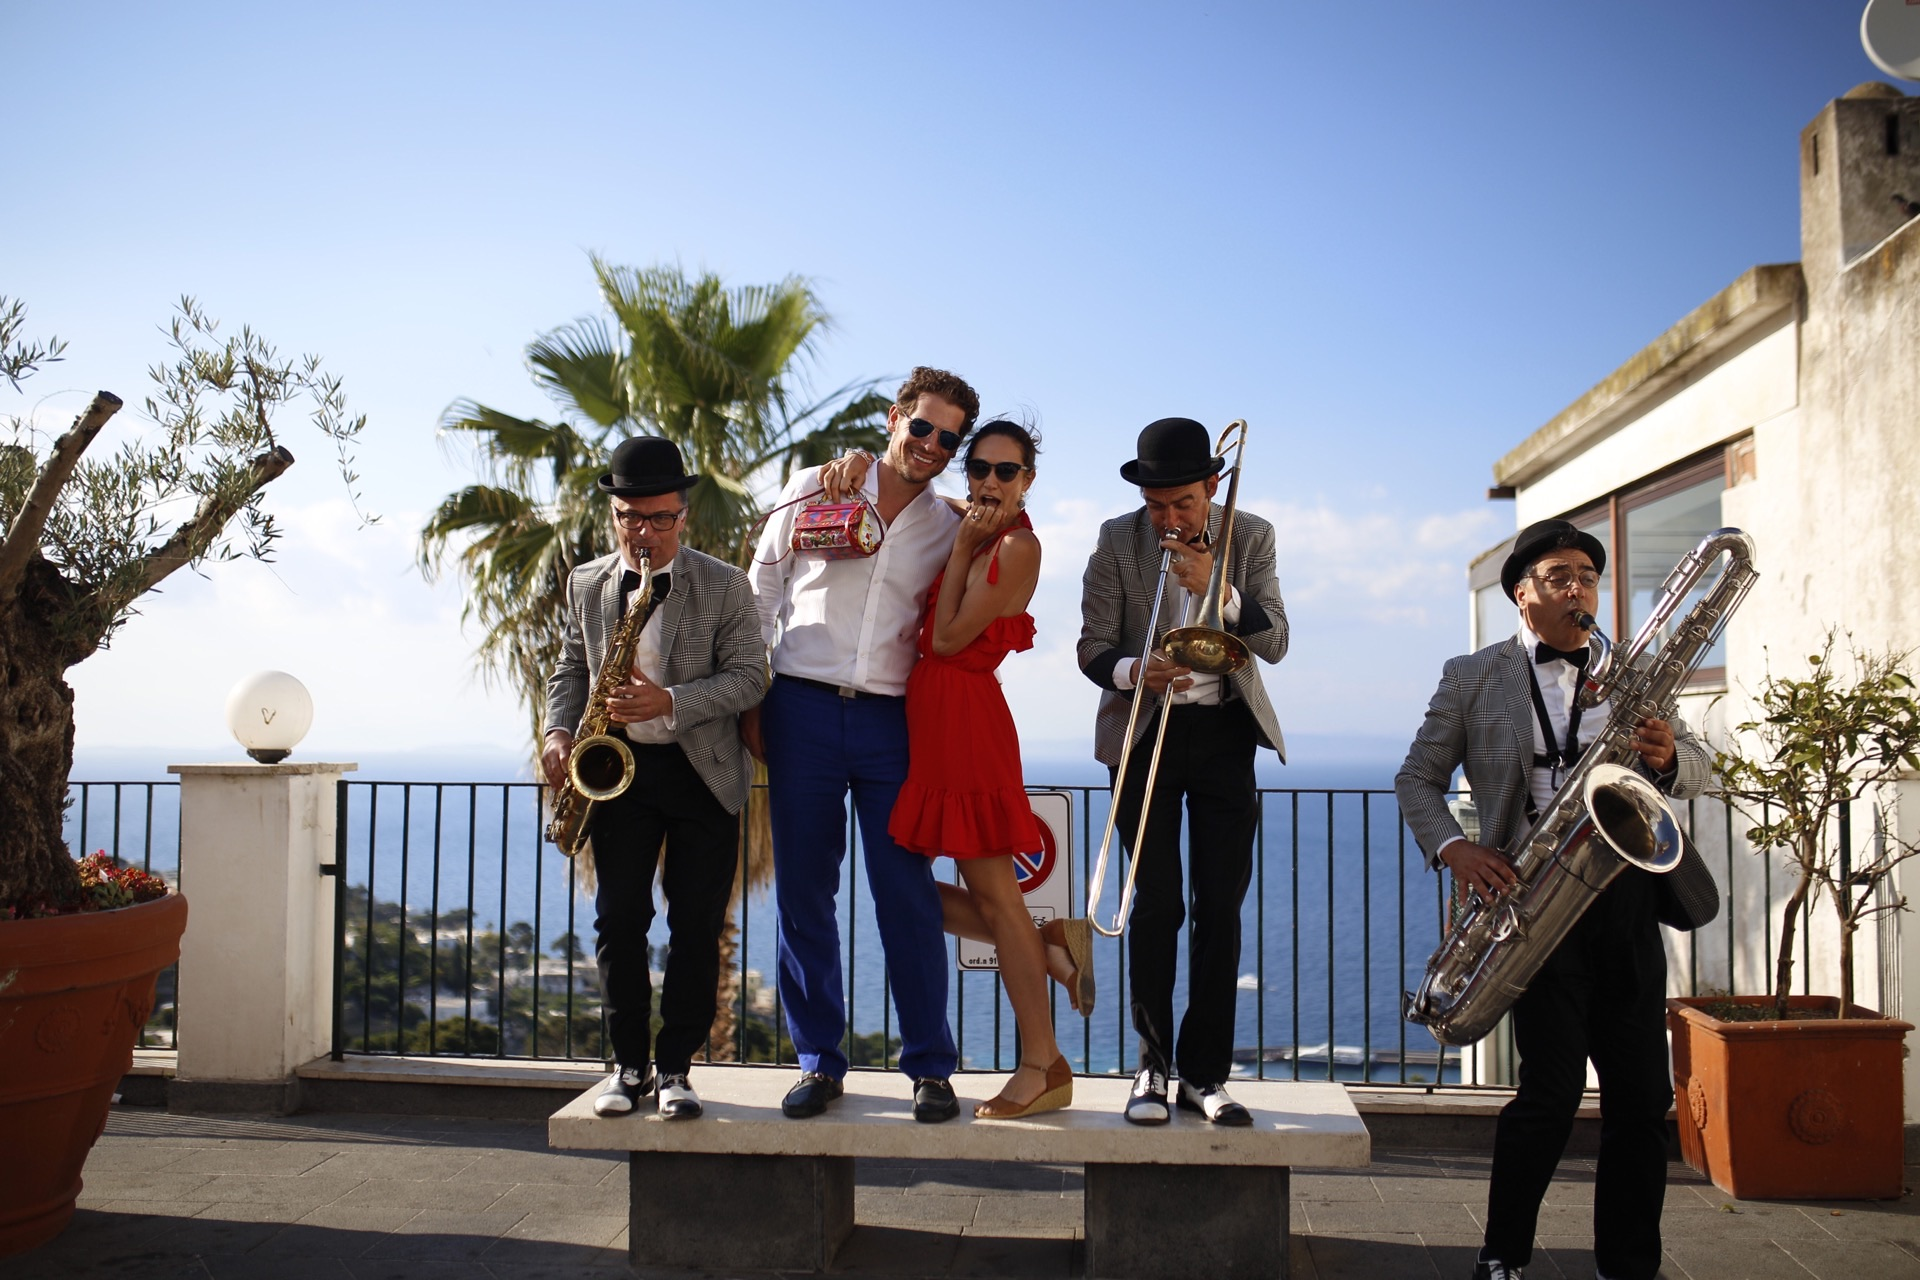 https://www.weddingamalfi.com/wp-content/uploads/Day-2-nathalie-and-banjamin-in-Capri.jpg